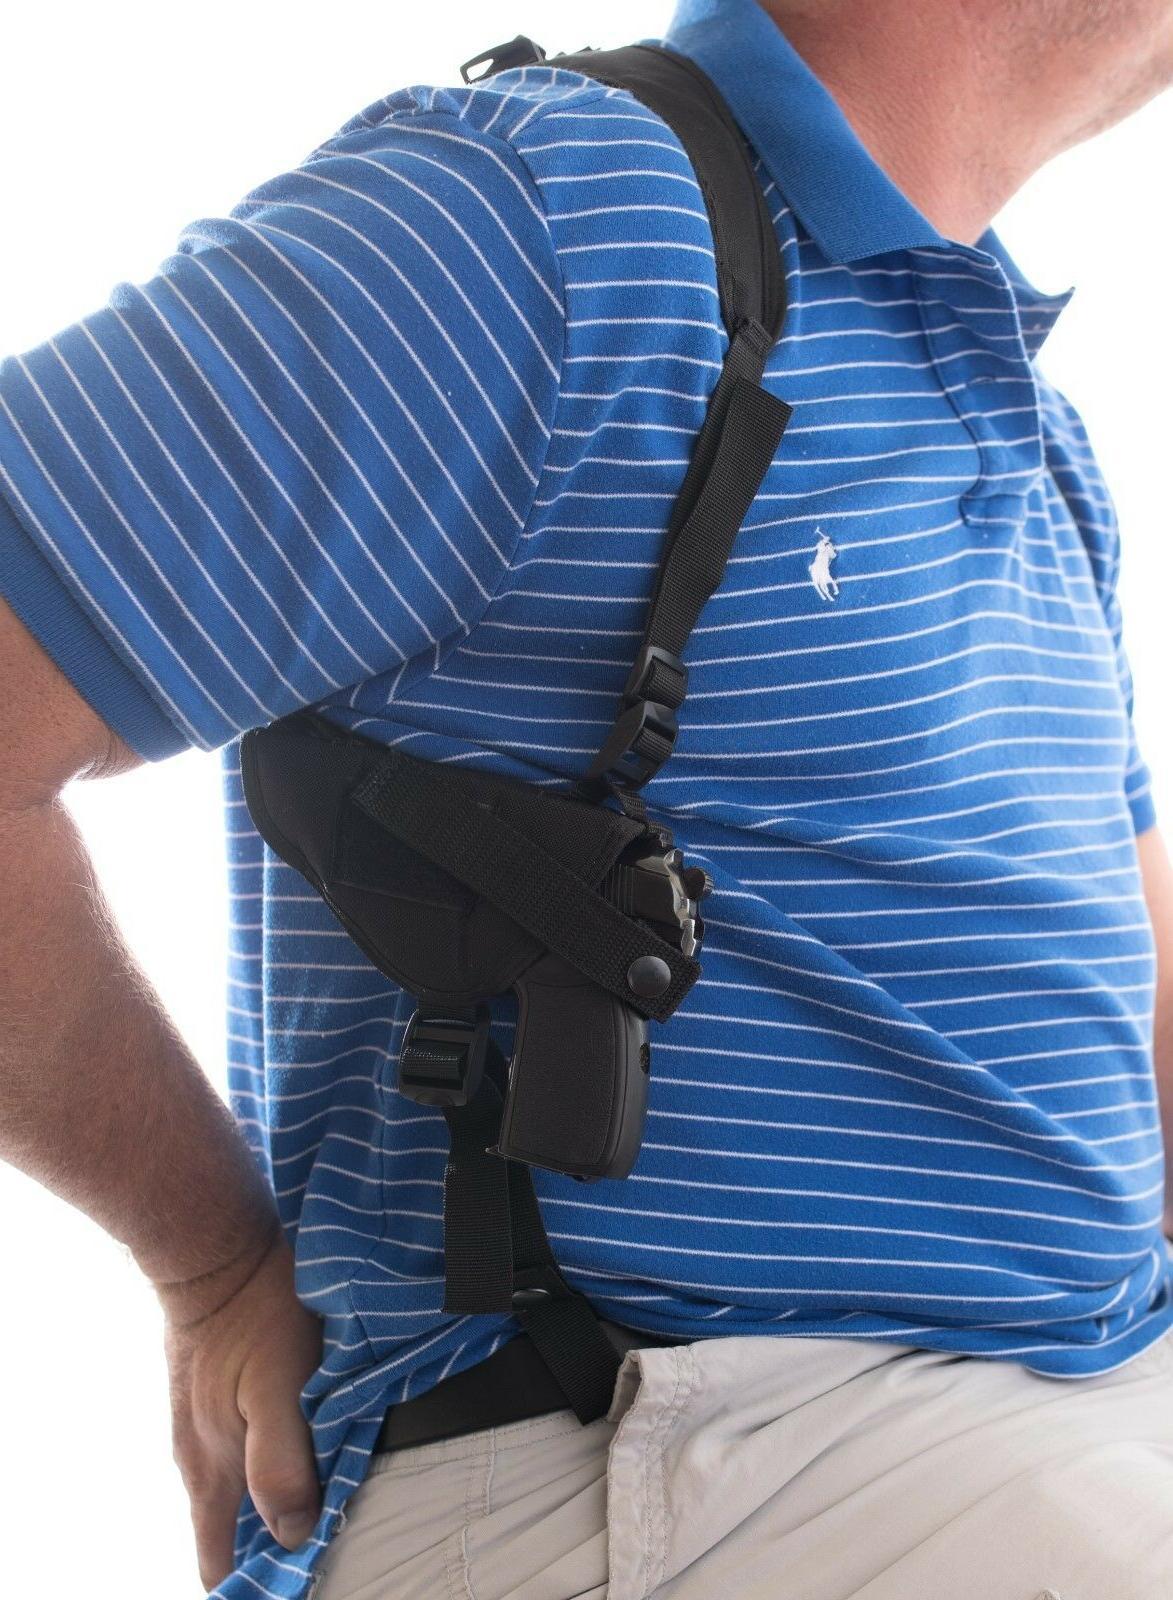 gun holster shoulder taurus g2c semis automatic